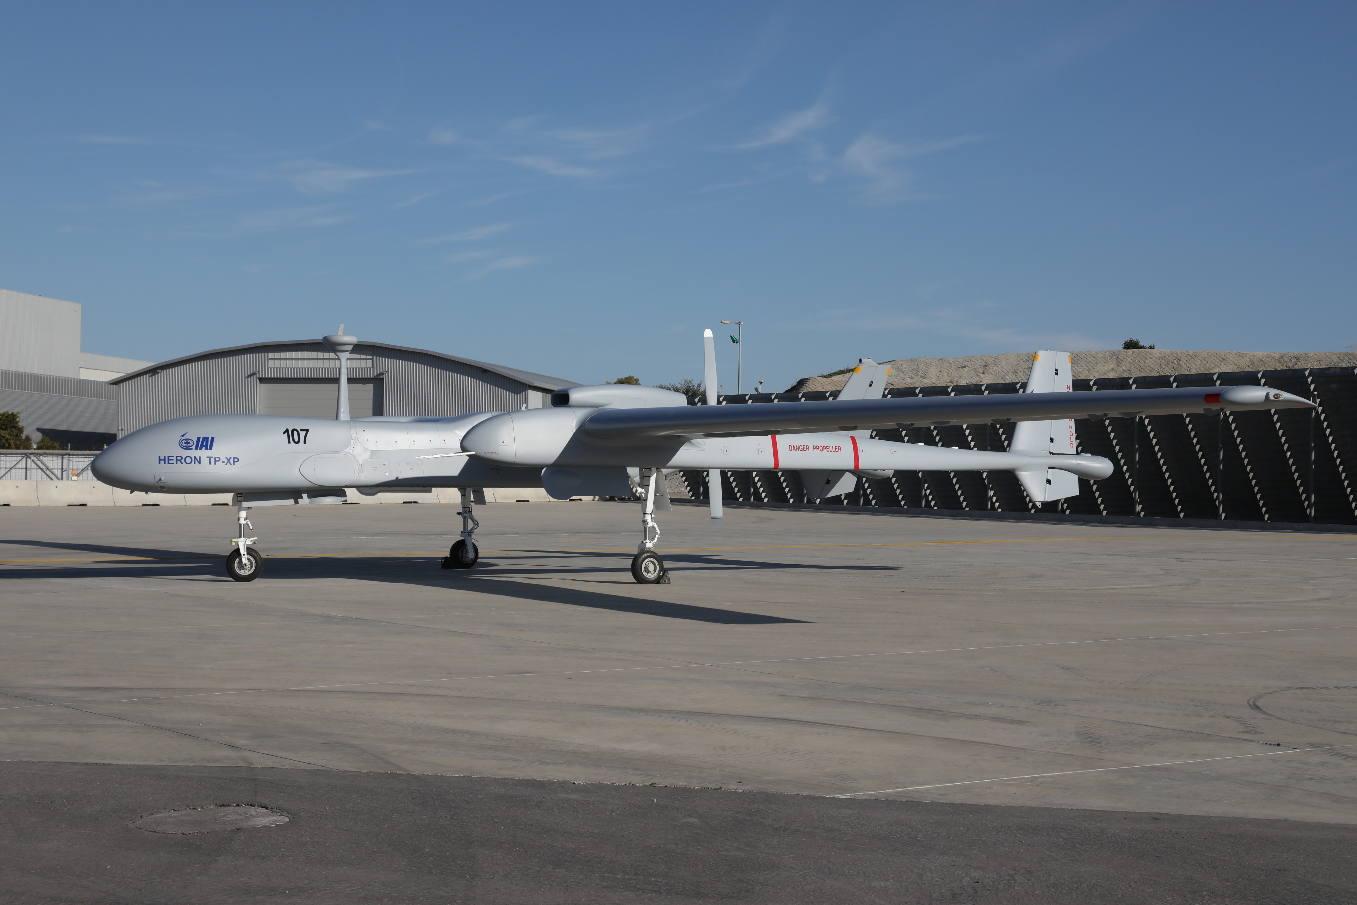 Aero India 2017: IAI to introduce Heron TP-XP UAV